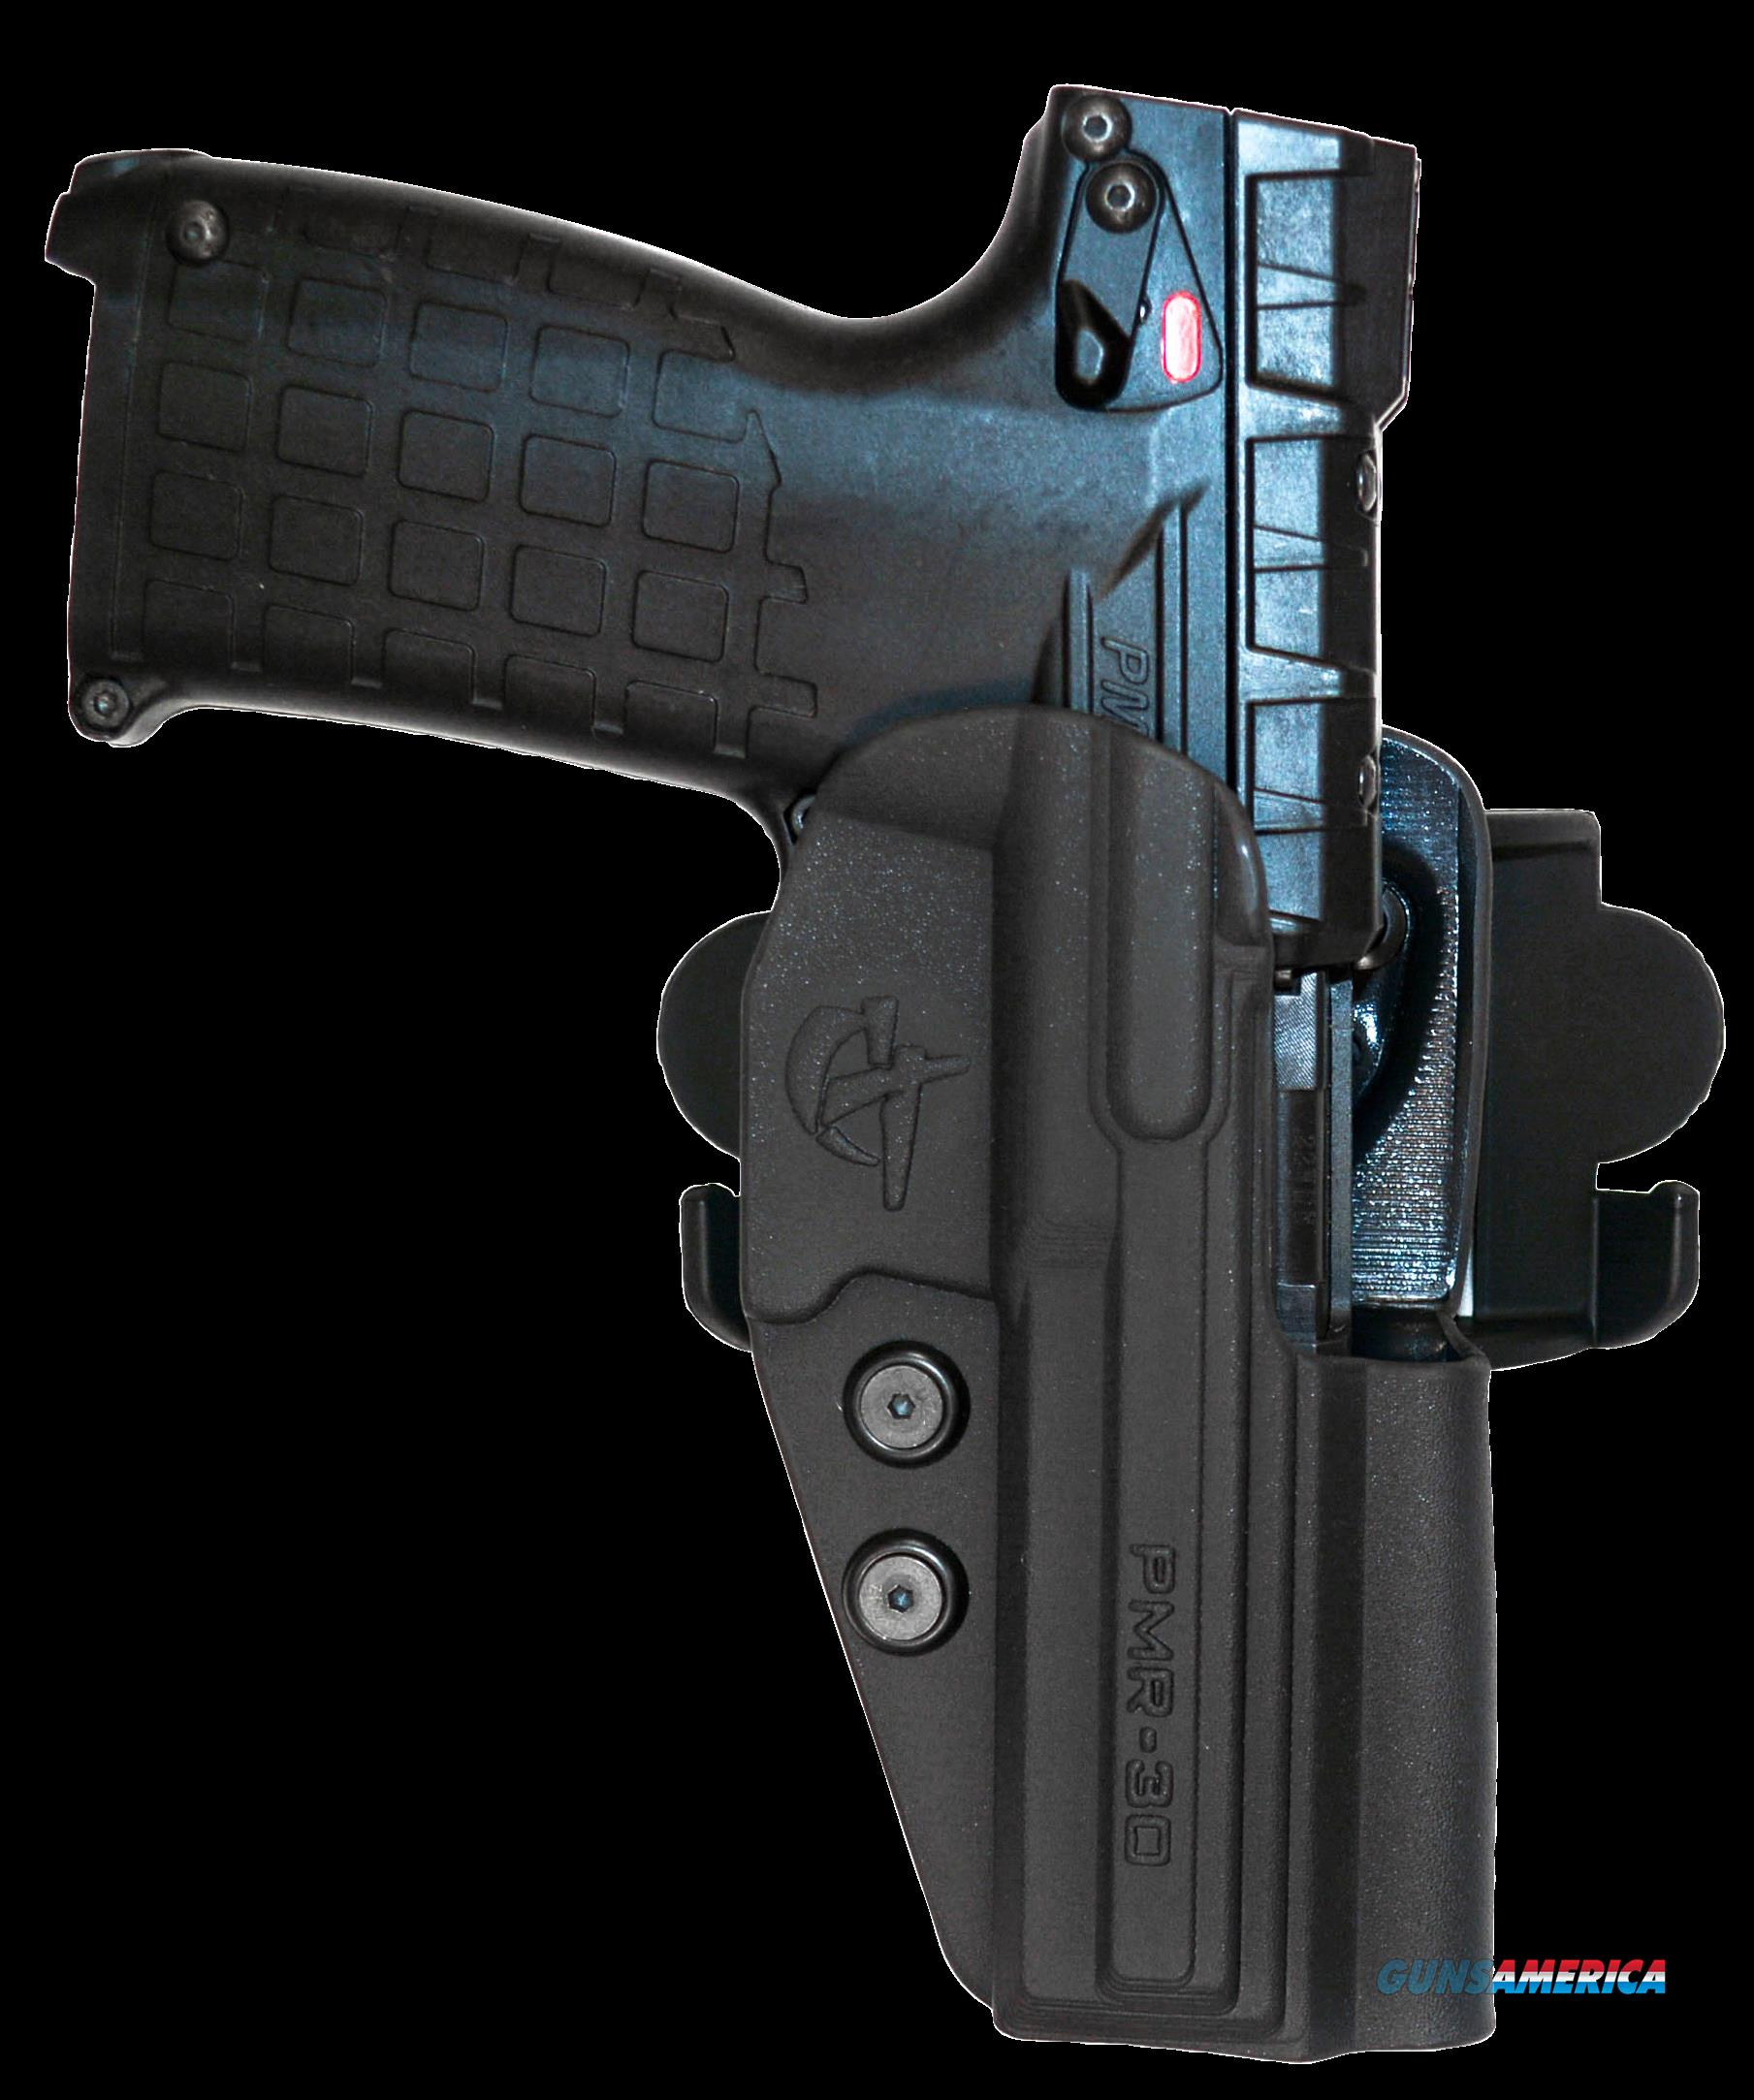 Comp-tac International, Comptac International Owb Hlstr Keltec Pmr 30  Guns > Pistols > 1911 Pistol Copies (non-Colt)